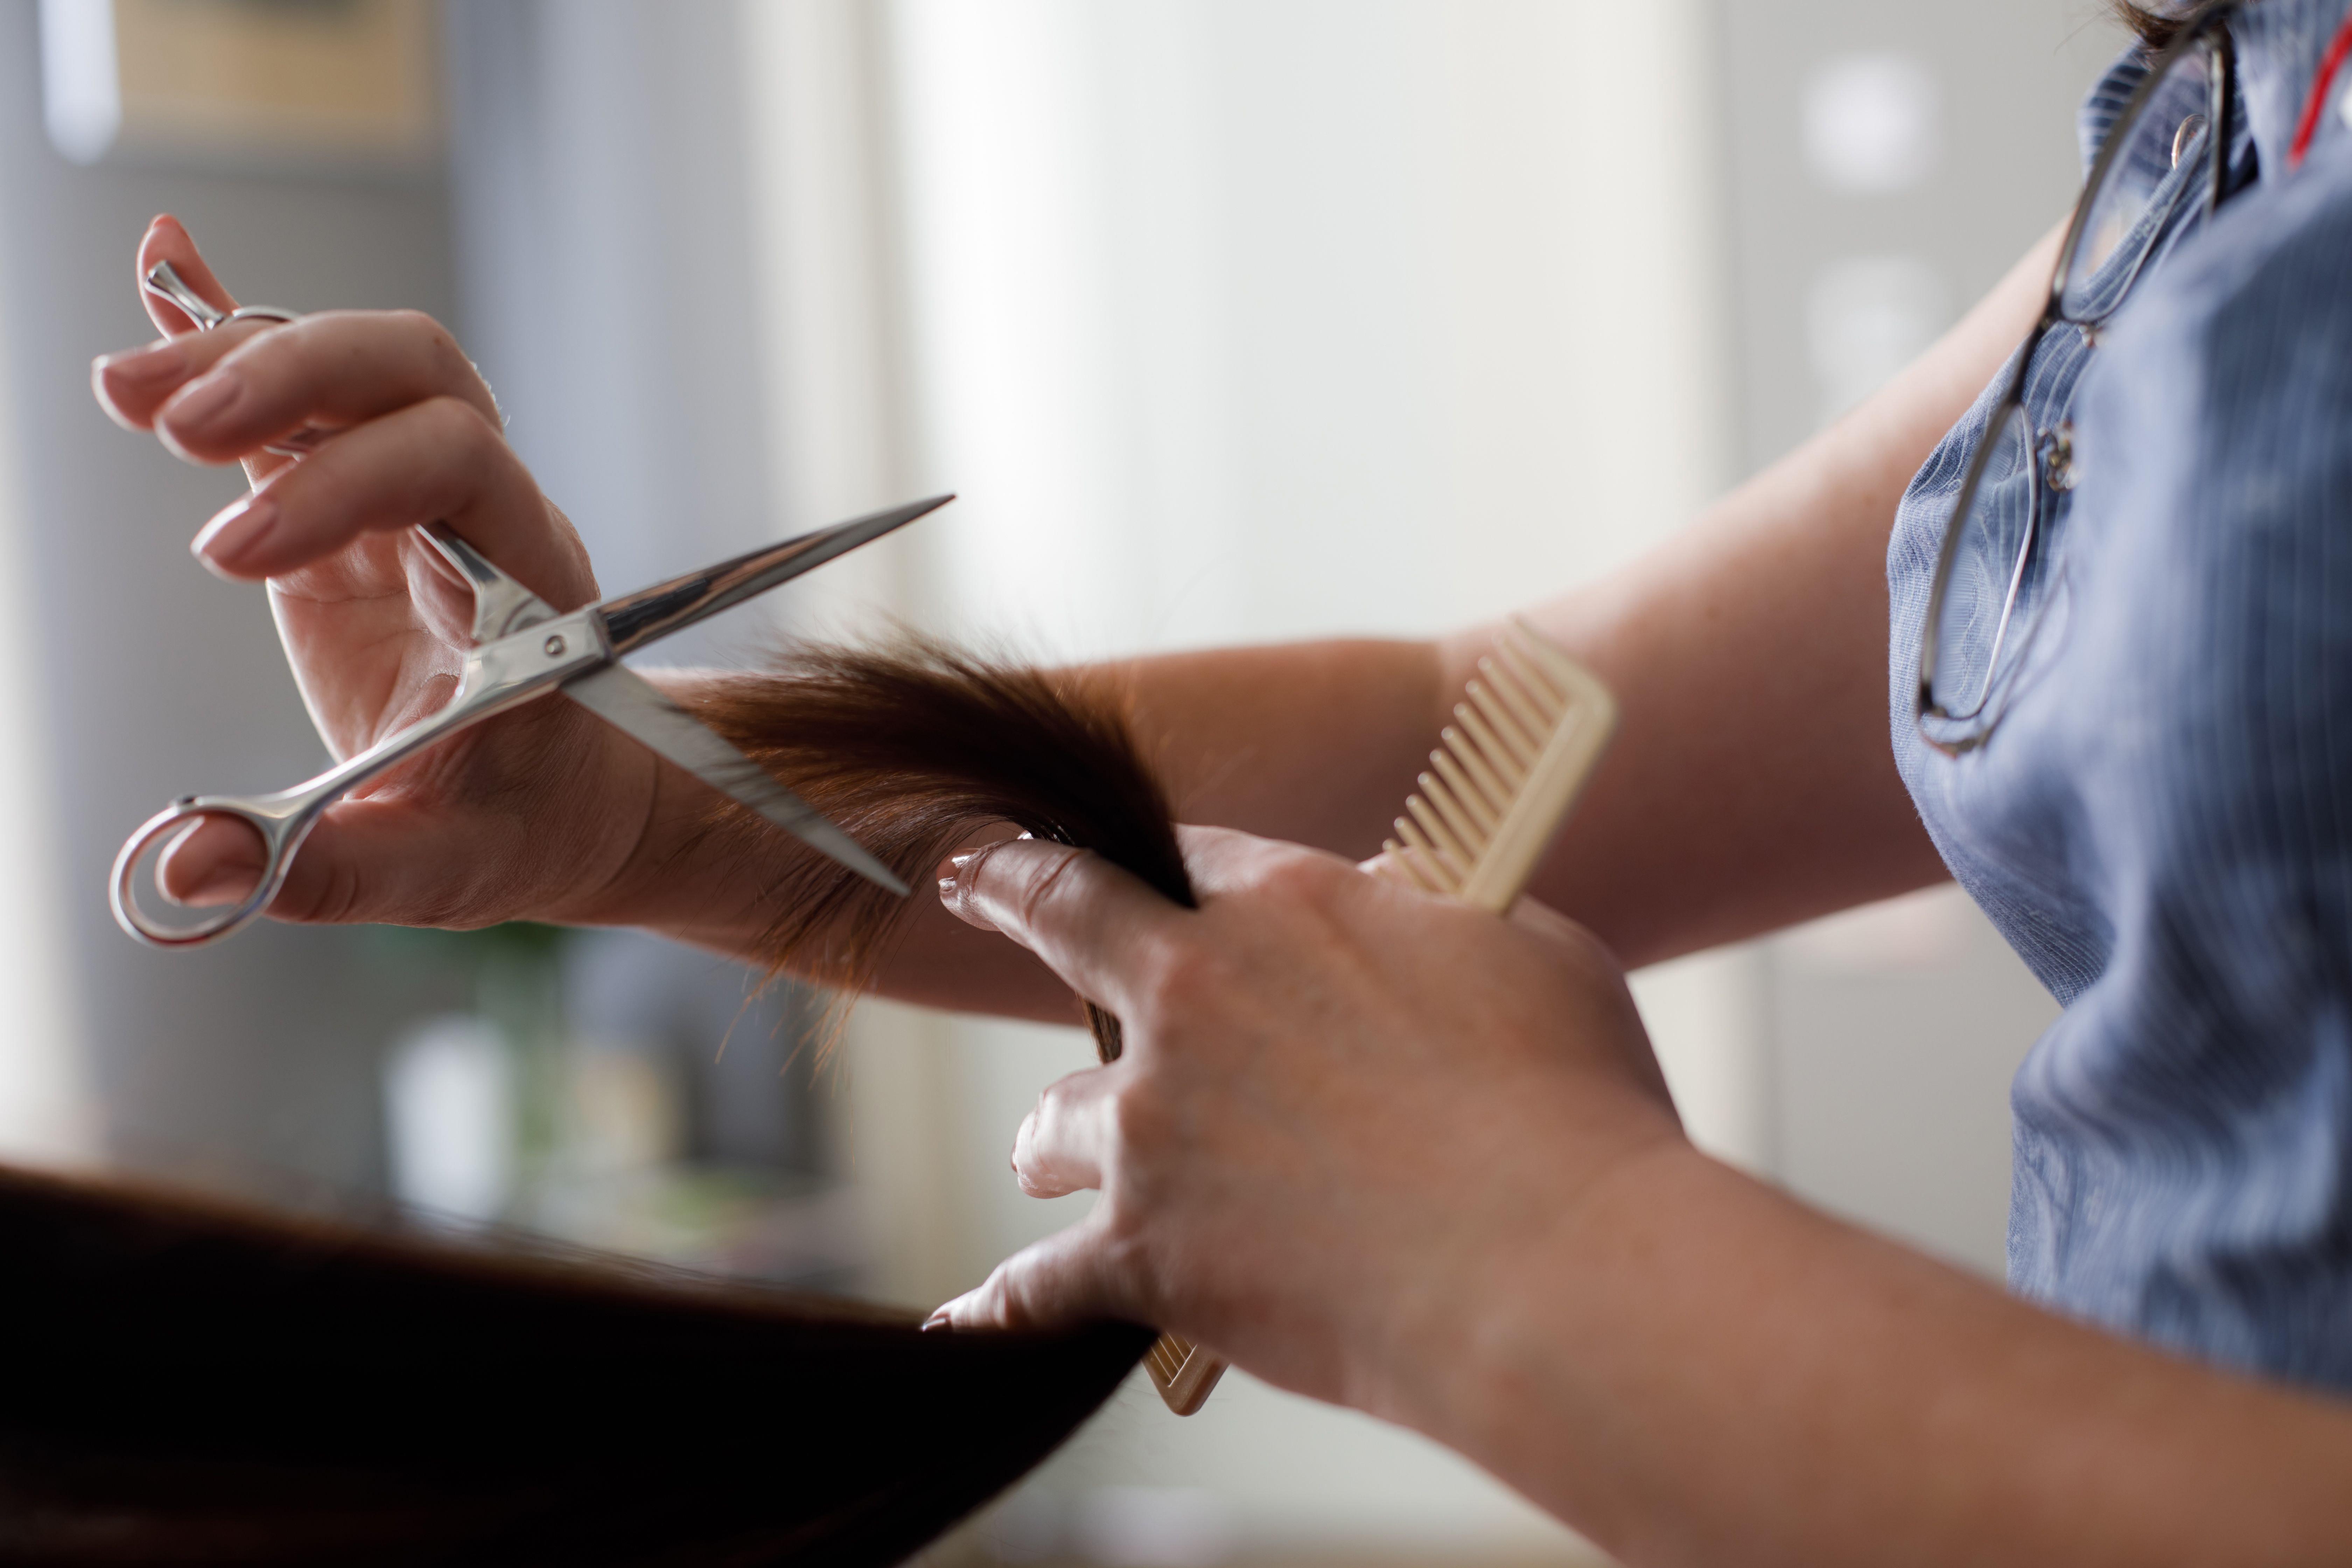 A hairdresser cutting someone's hair. | Source: Shutterstock